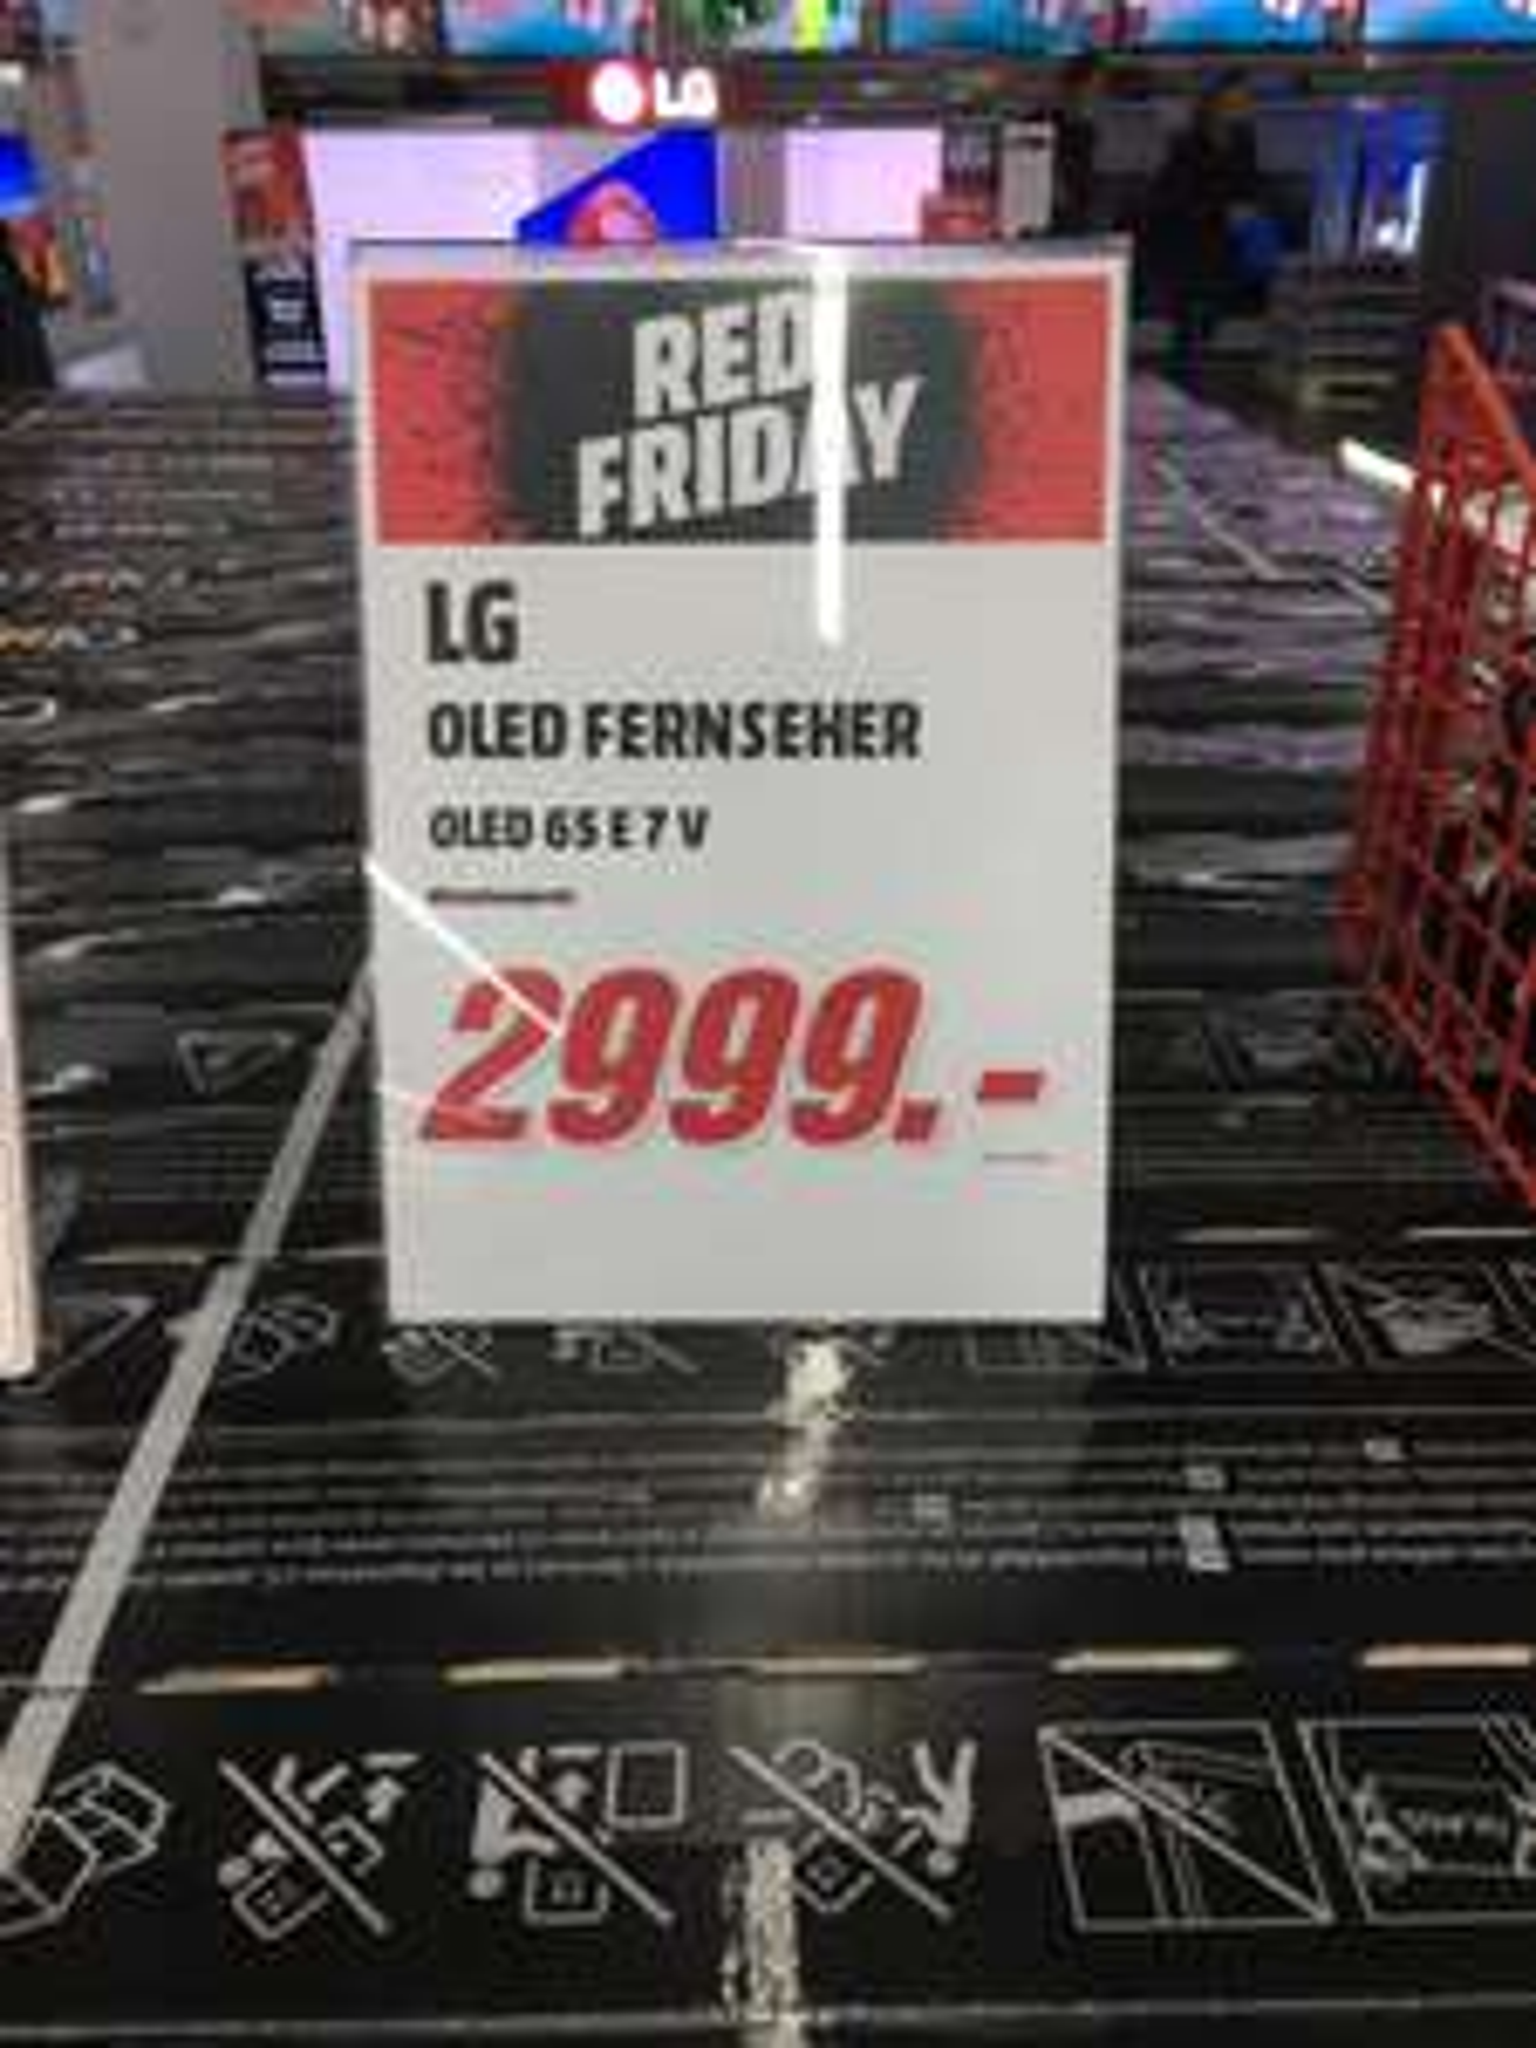 LG oled 65e7v für 2999 bei Mediamarkt Berlin im alexa (lokal)